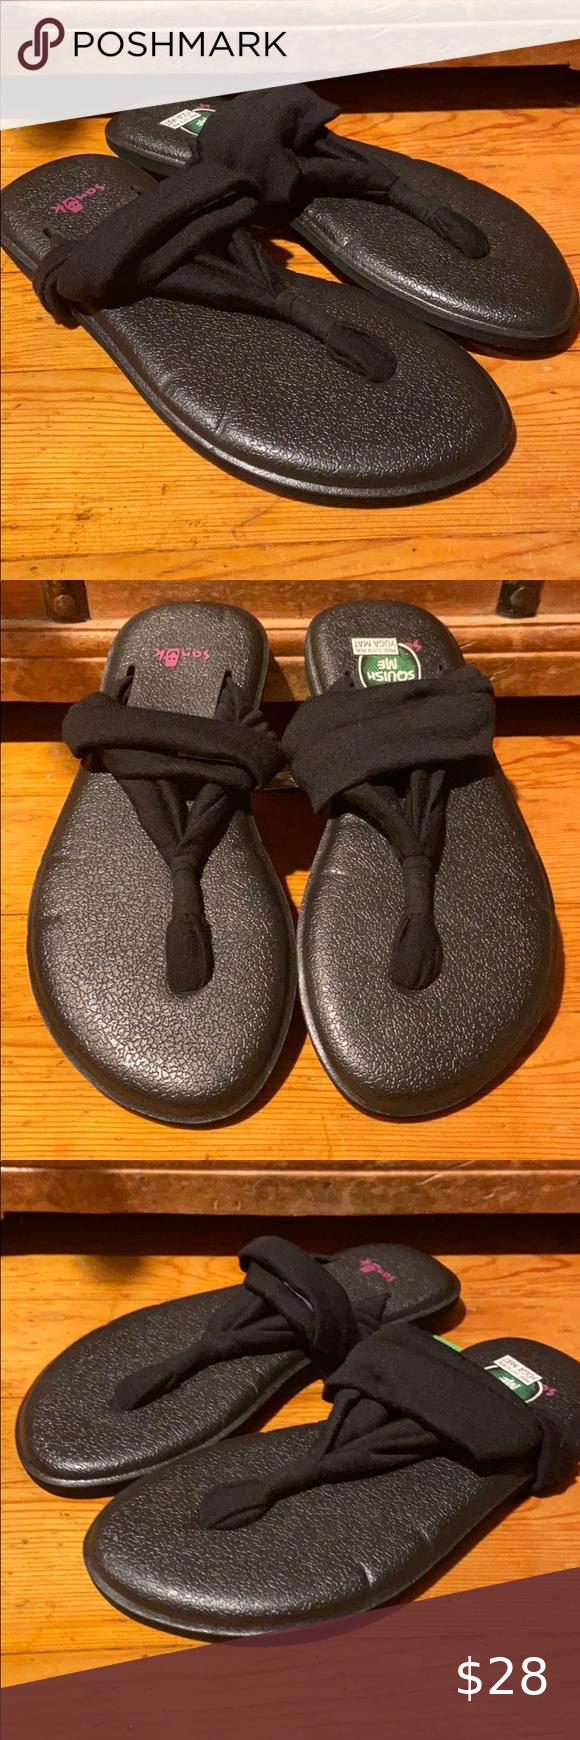 12+ Yoga mat sling shoes ideas